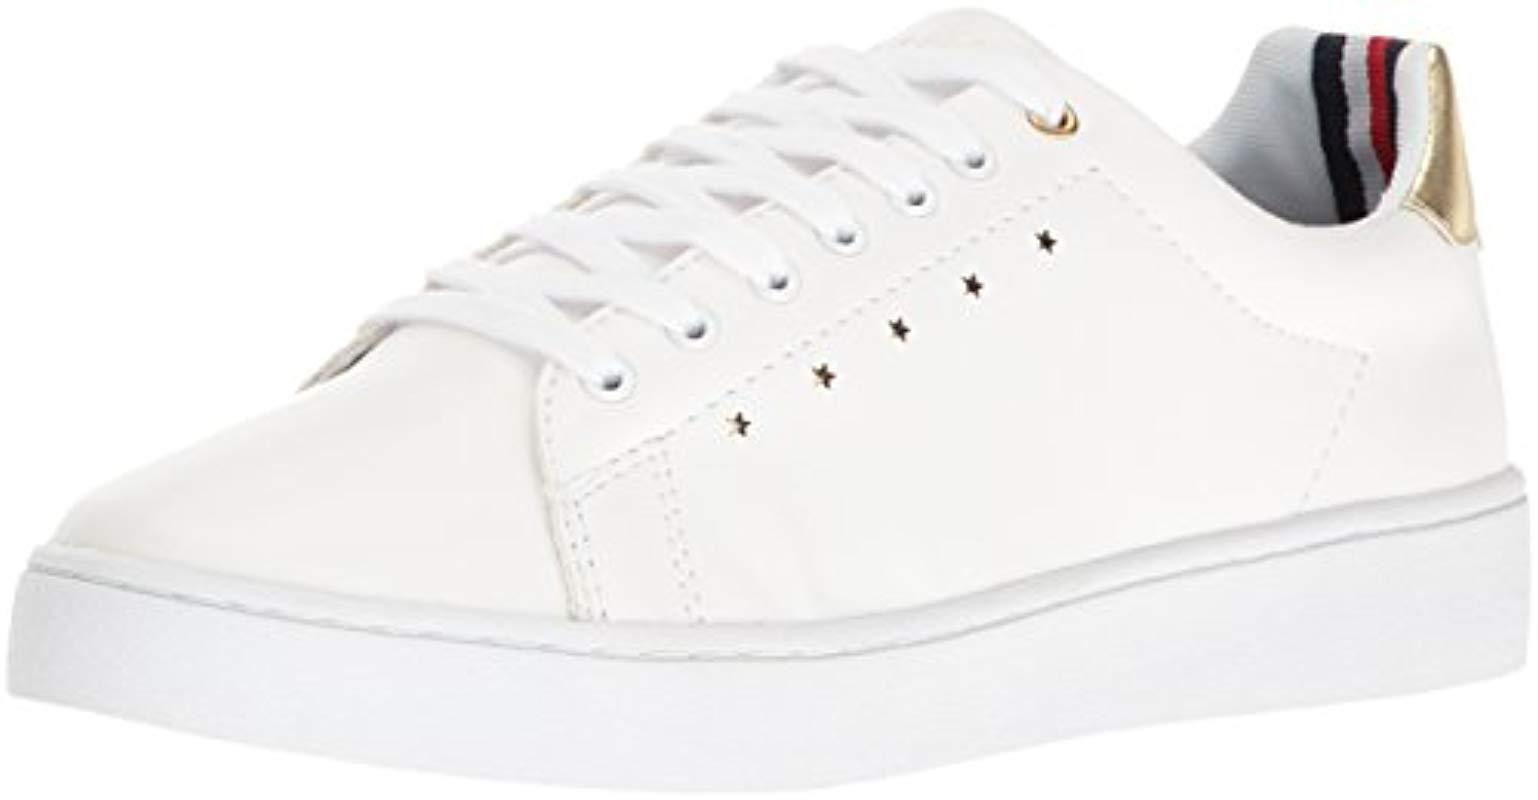 bf756bc67 Tommy Hilfiger. Women's White Sassa Sneaker. $59 $40 From Amazon Prime